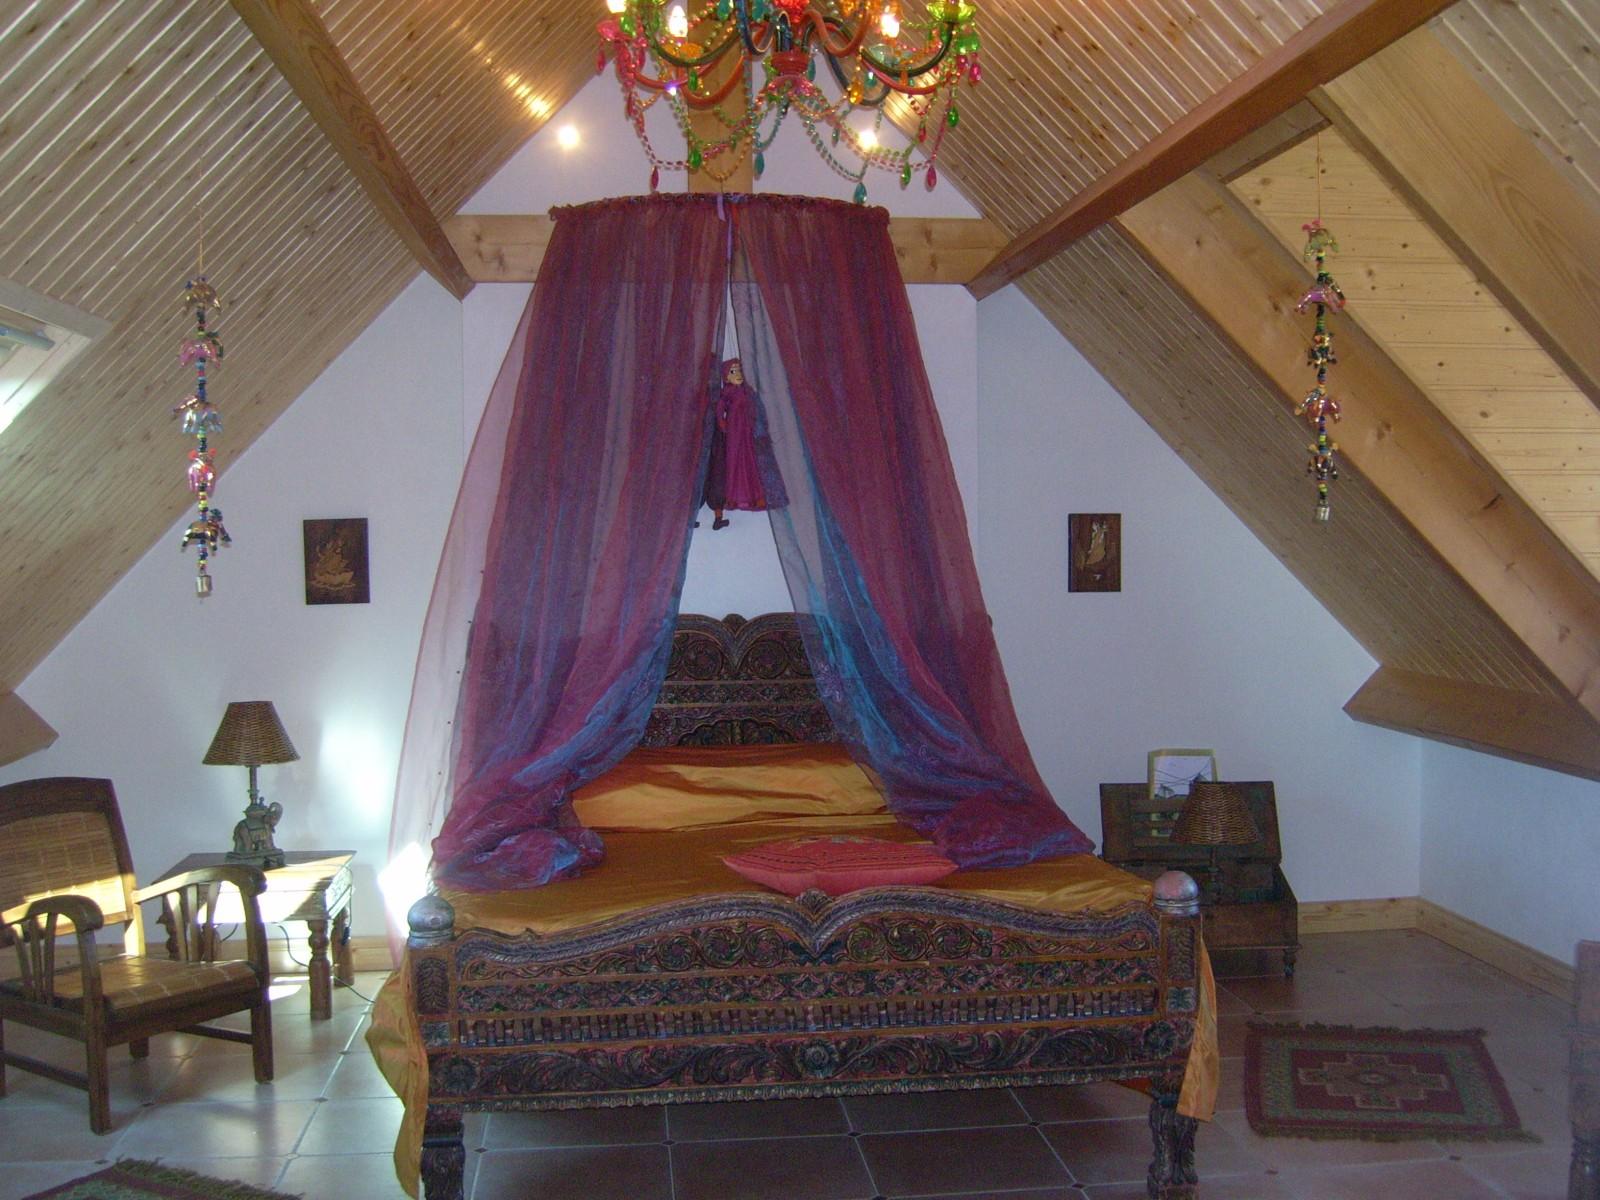 chambres d 39 h tes bangor belle le 11 personnes katy et andr gonidec. Black Bedroom Furniture Sets. Home Design Ideas